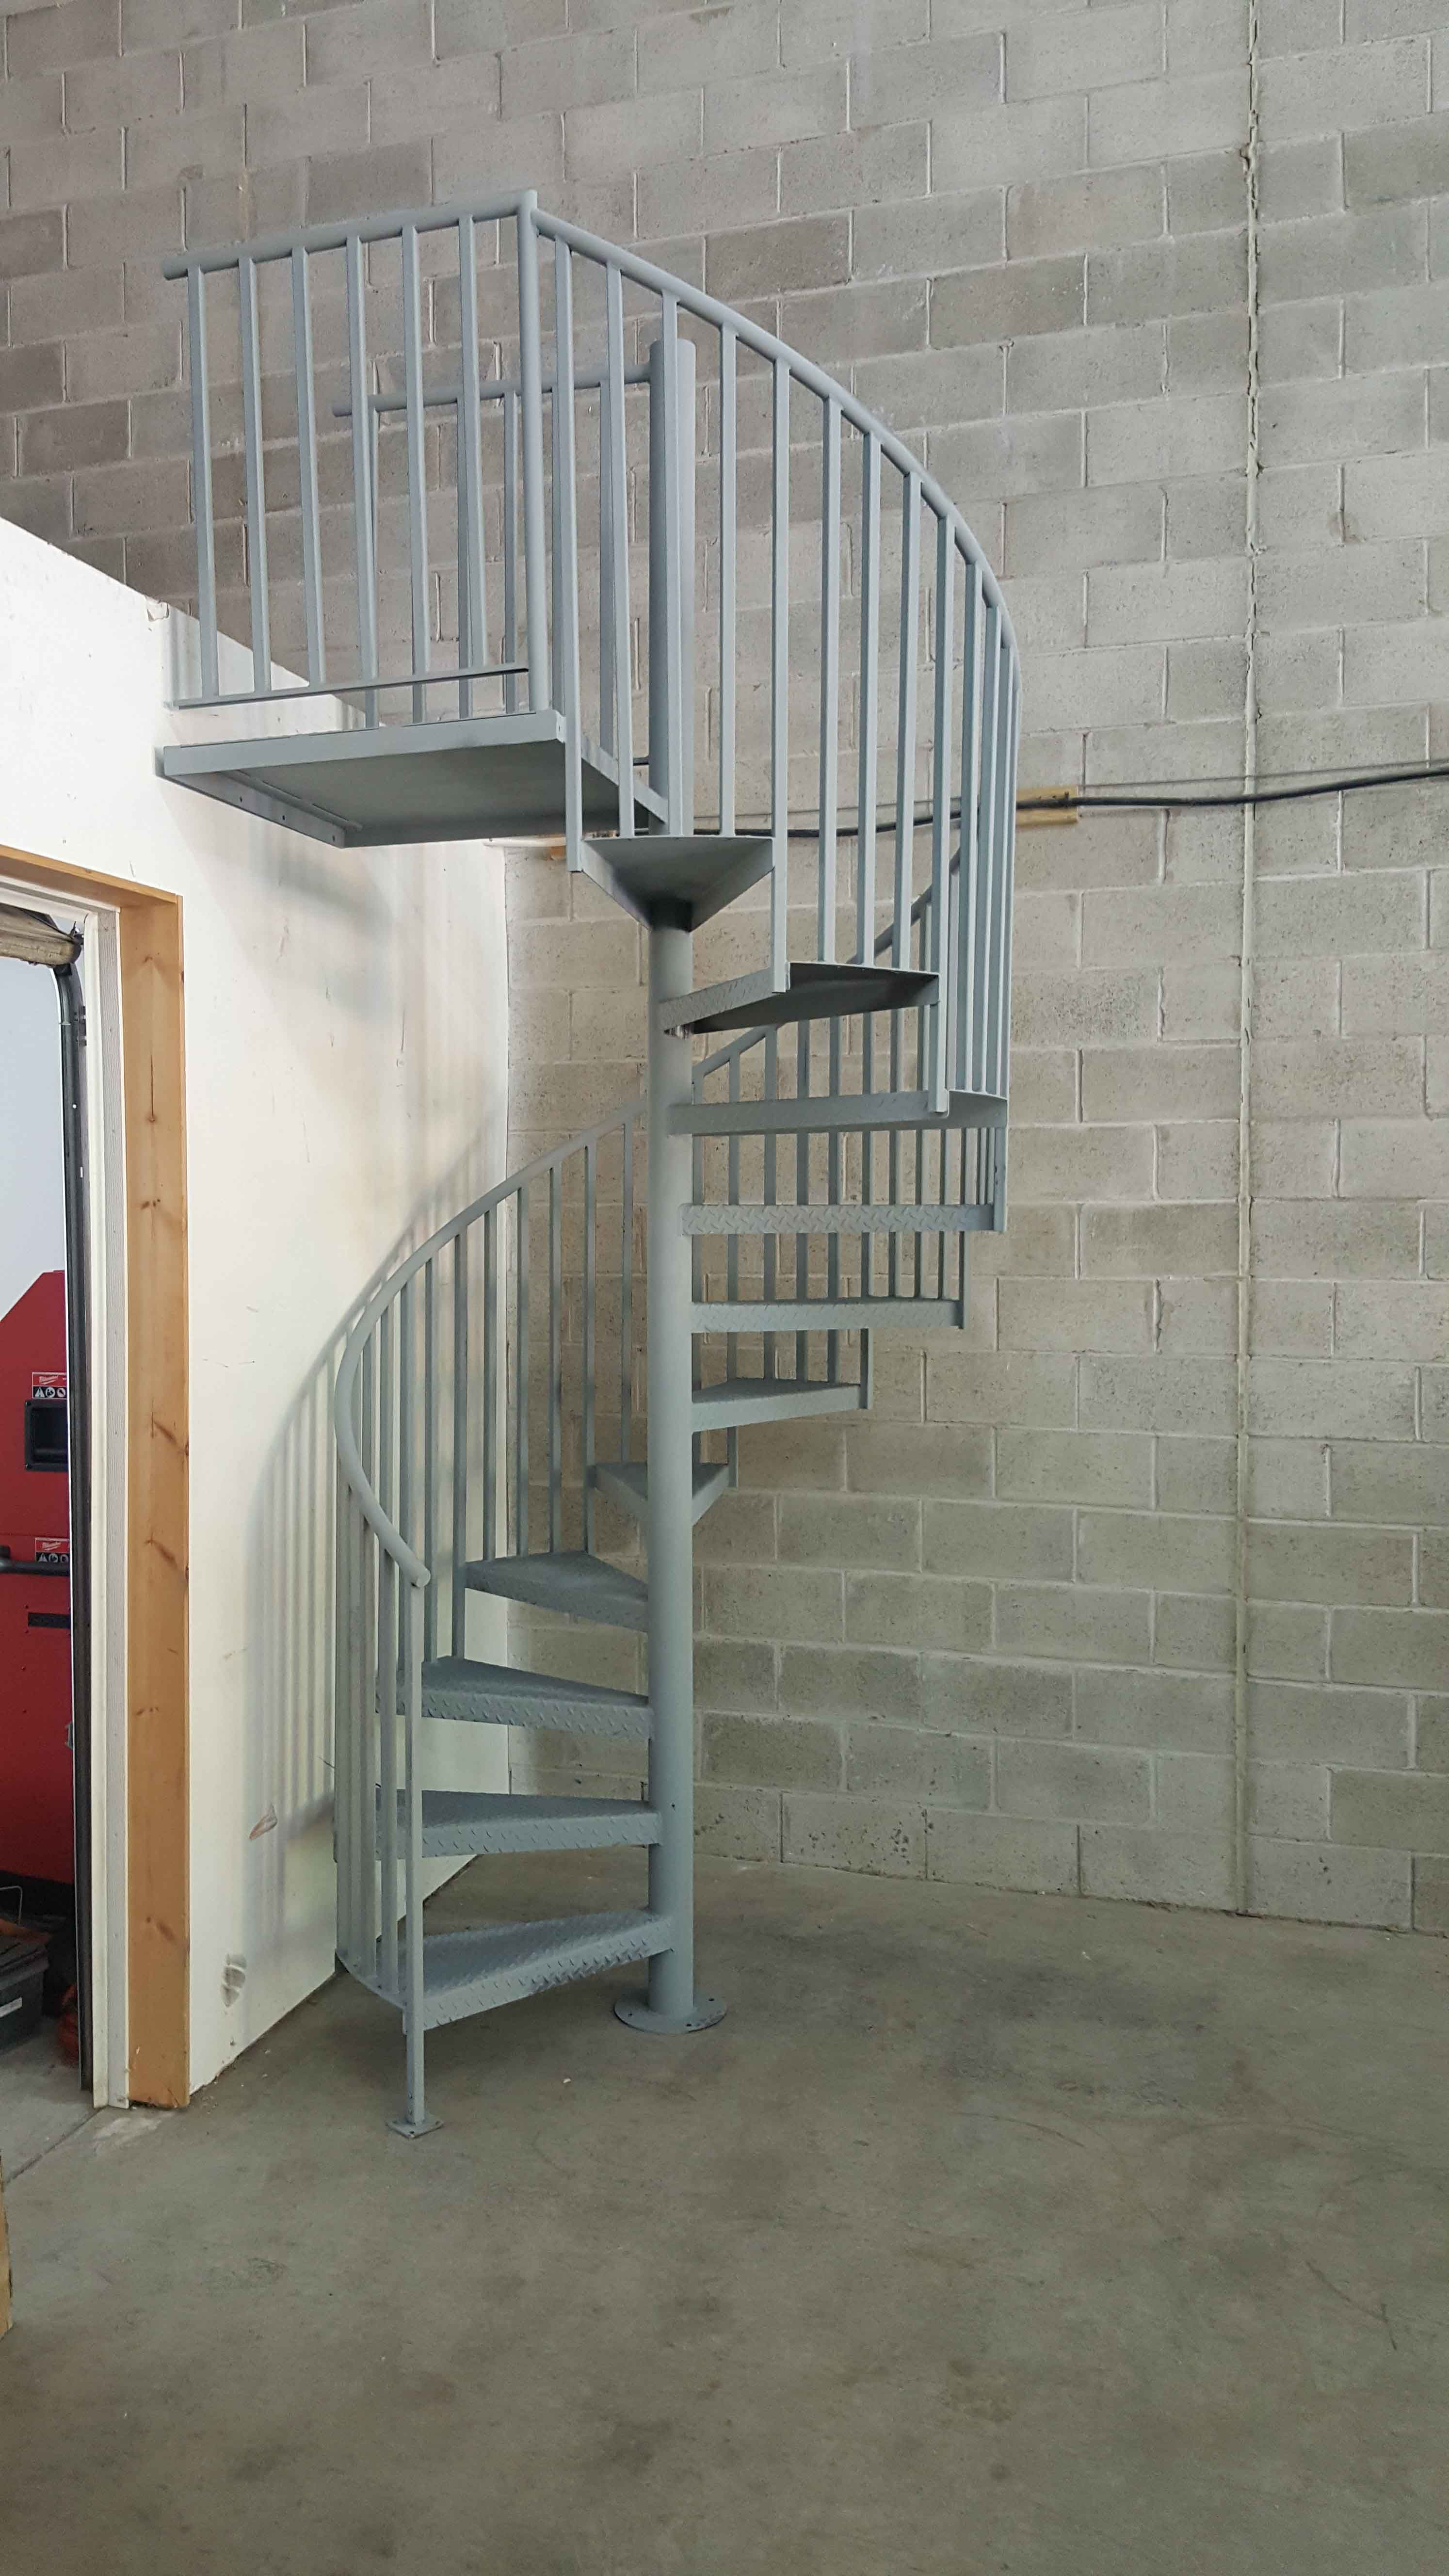 Interior Spiral Staircase Grey Spiral Staircase Kits Staircase | Steel Spiral Staircase Design | Concrete | Outdoor | Wood | Structural | Cast Iron